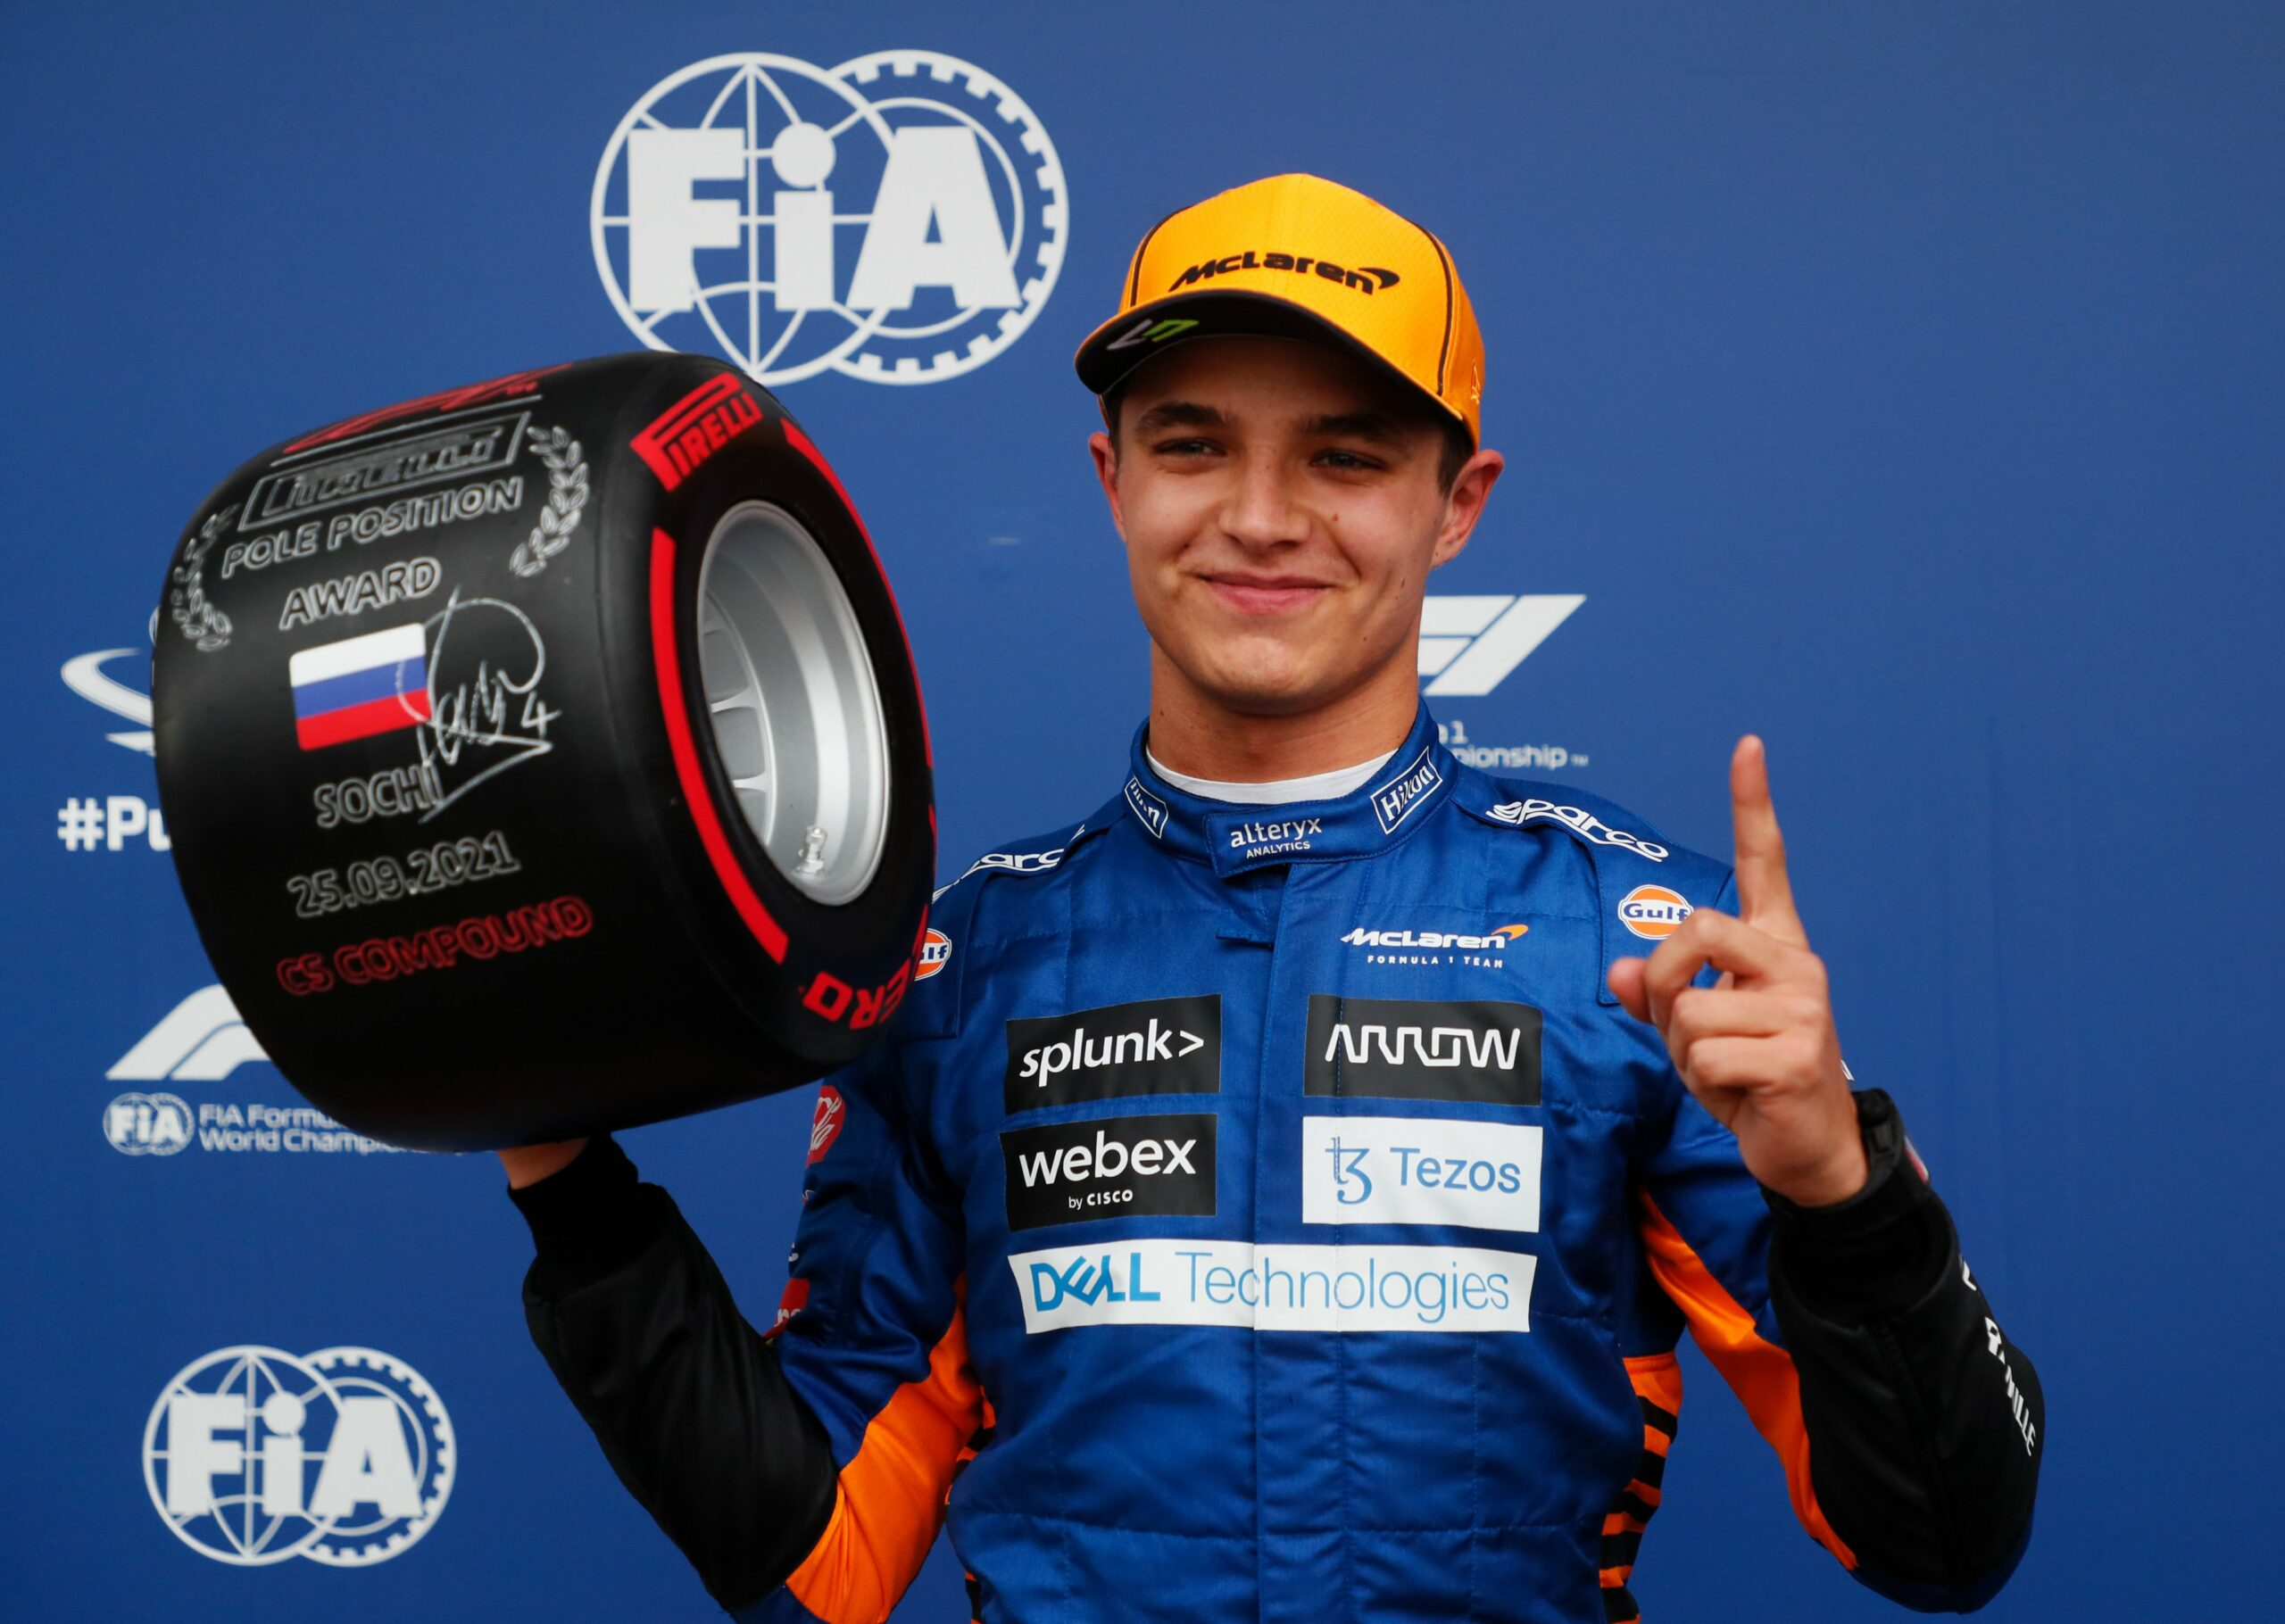 F1 - Norris en pole en Russie, devant Sainz et George Russell